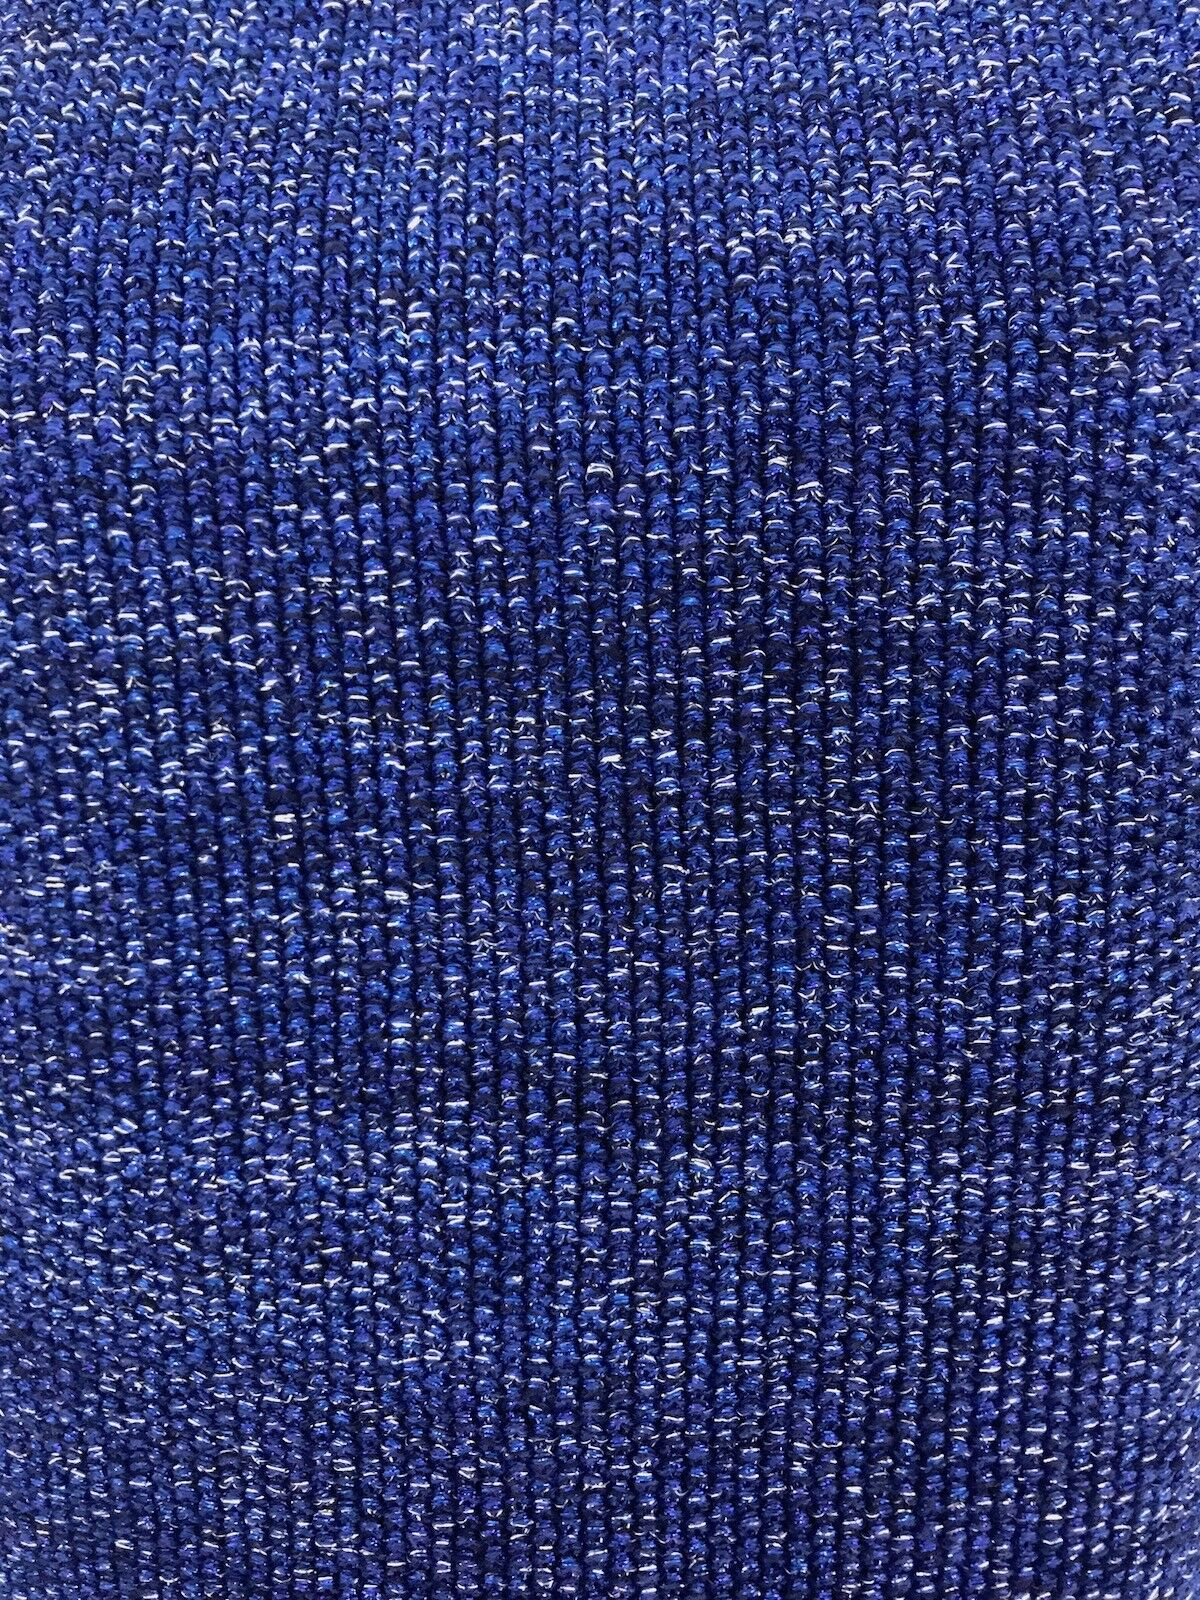 Maje Ladies Robe Trapeze Sleeveless Dress Marine Marine Marine Blau Größe 1 UK 8  US 4 43e8f1